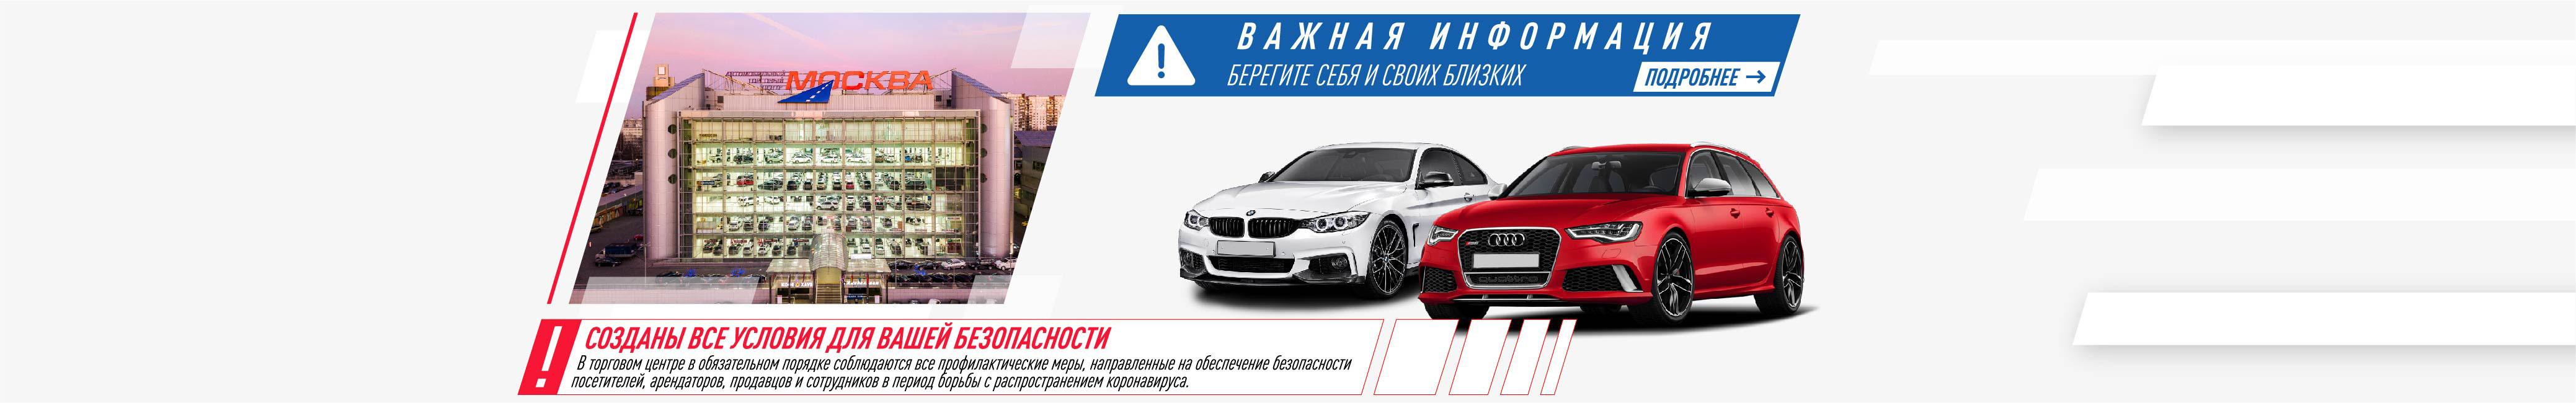 Атц автосалон в москве с пробегом автосалоны москвы нива шевроле цены